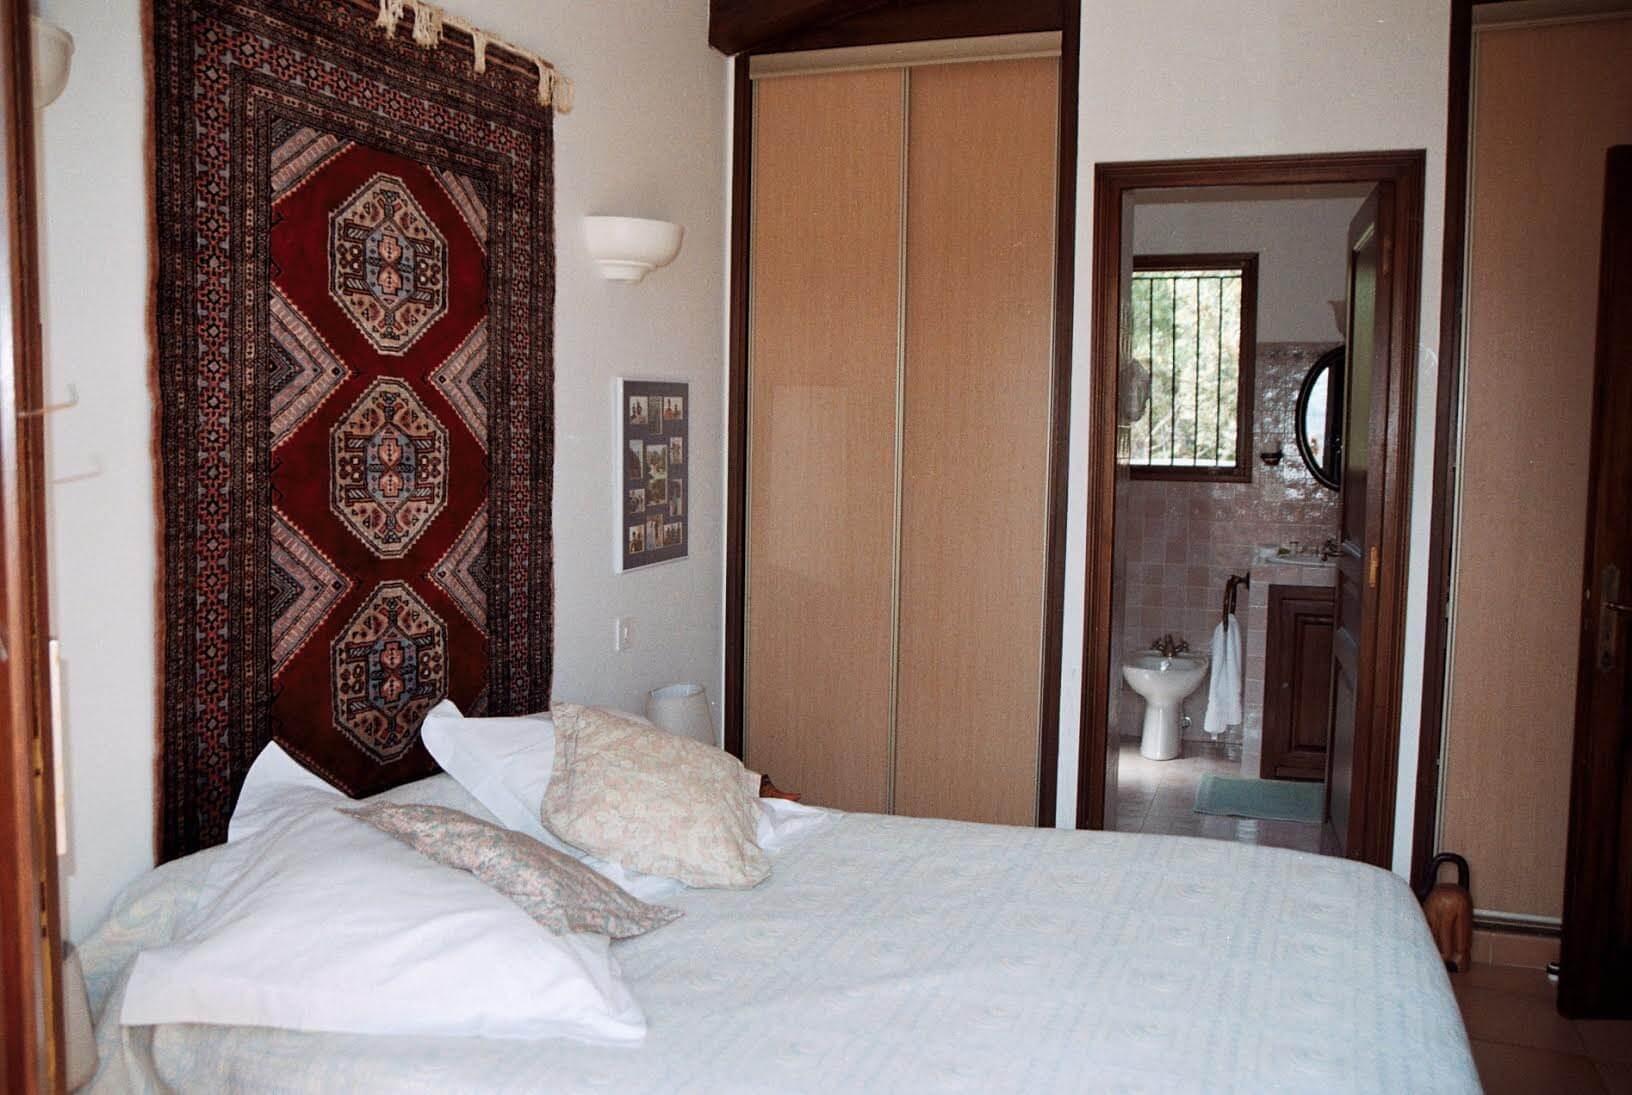 U Castellu Bedroom